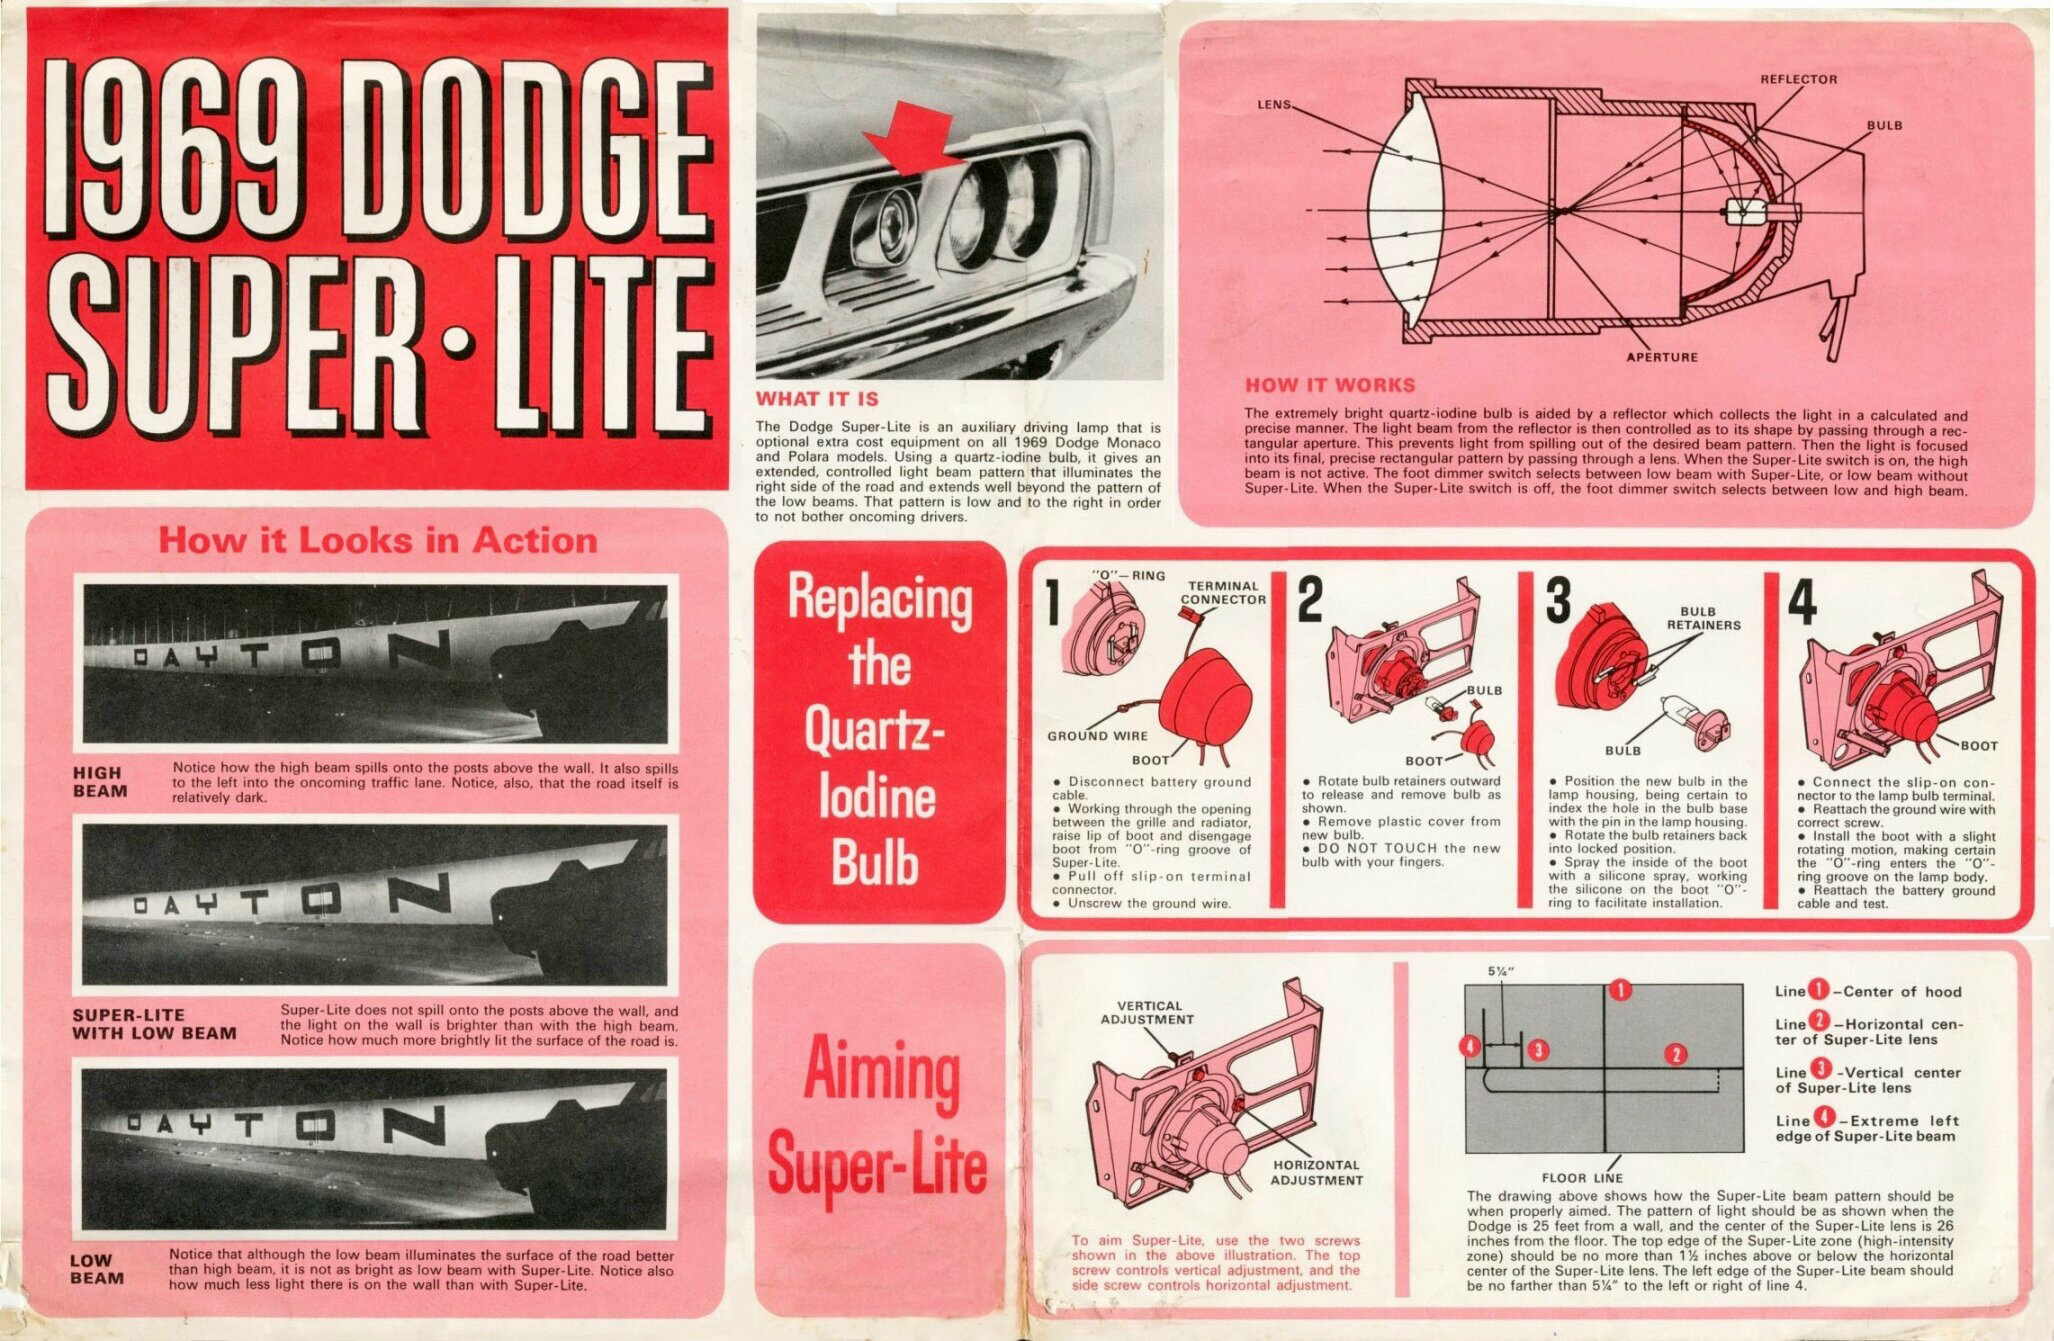 1969 Dodge Super-Lite advertisement